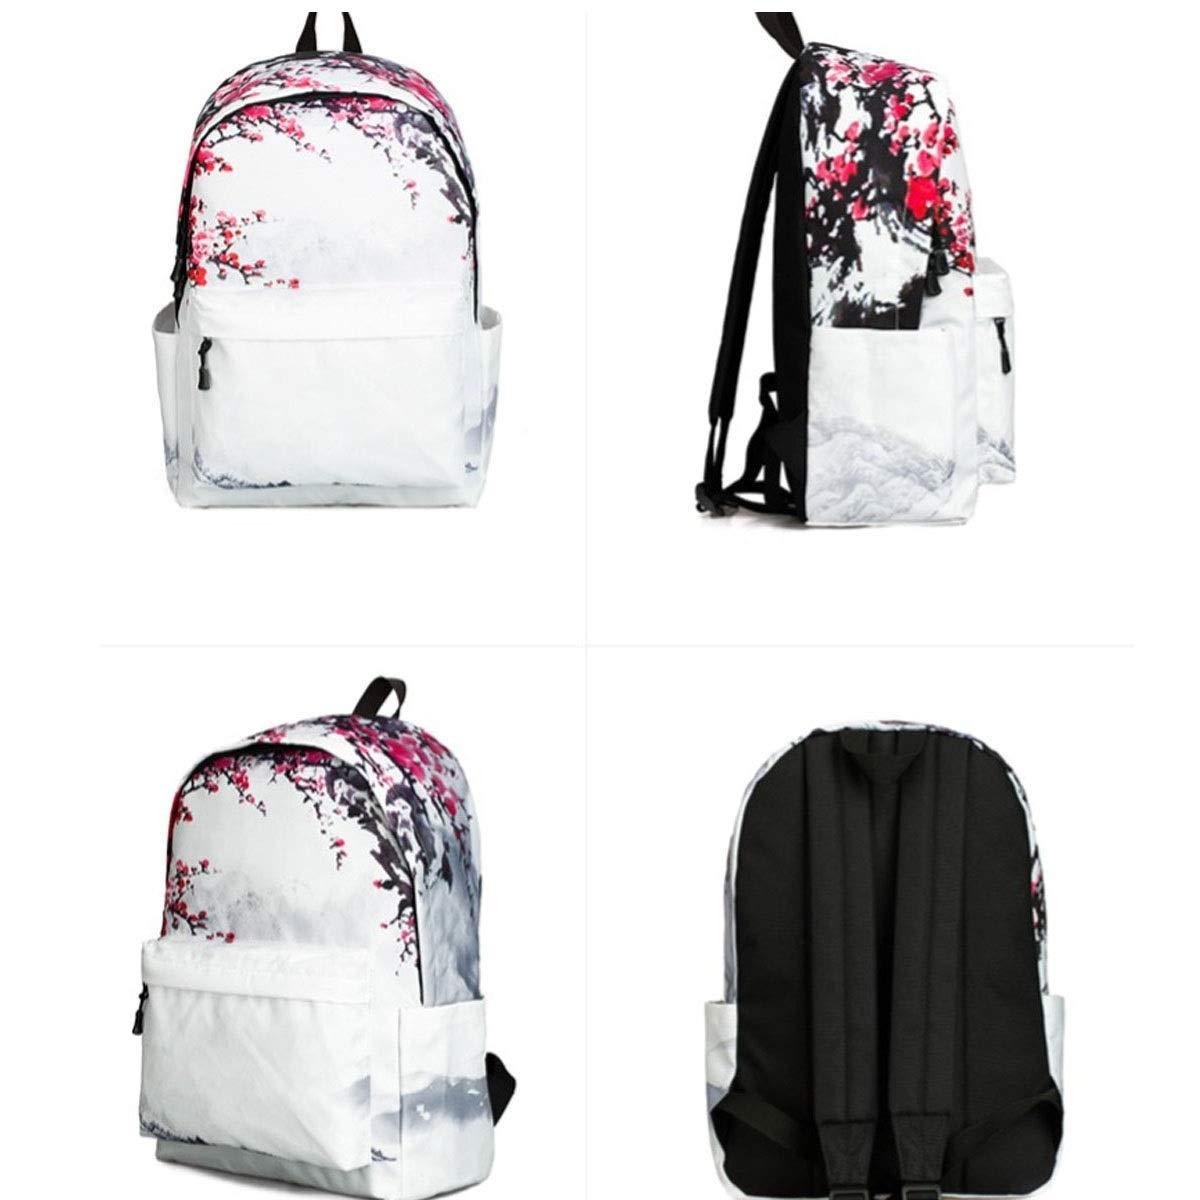 ZHONGYUE Cute Laptop Backpack for Kids Canvas Backpack Girls Daypack School Bag Fabric